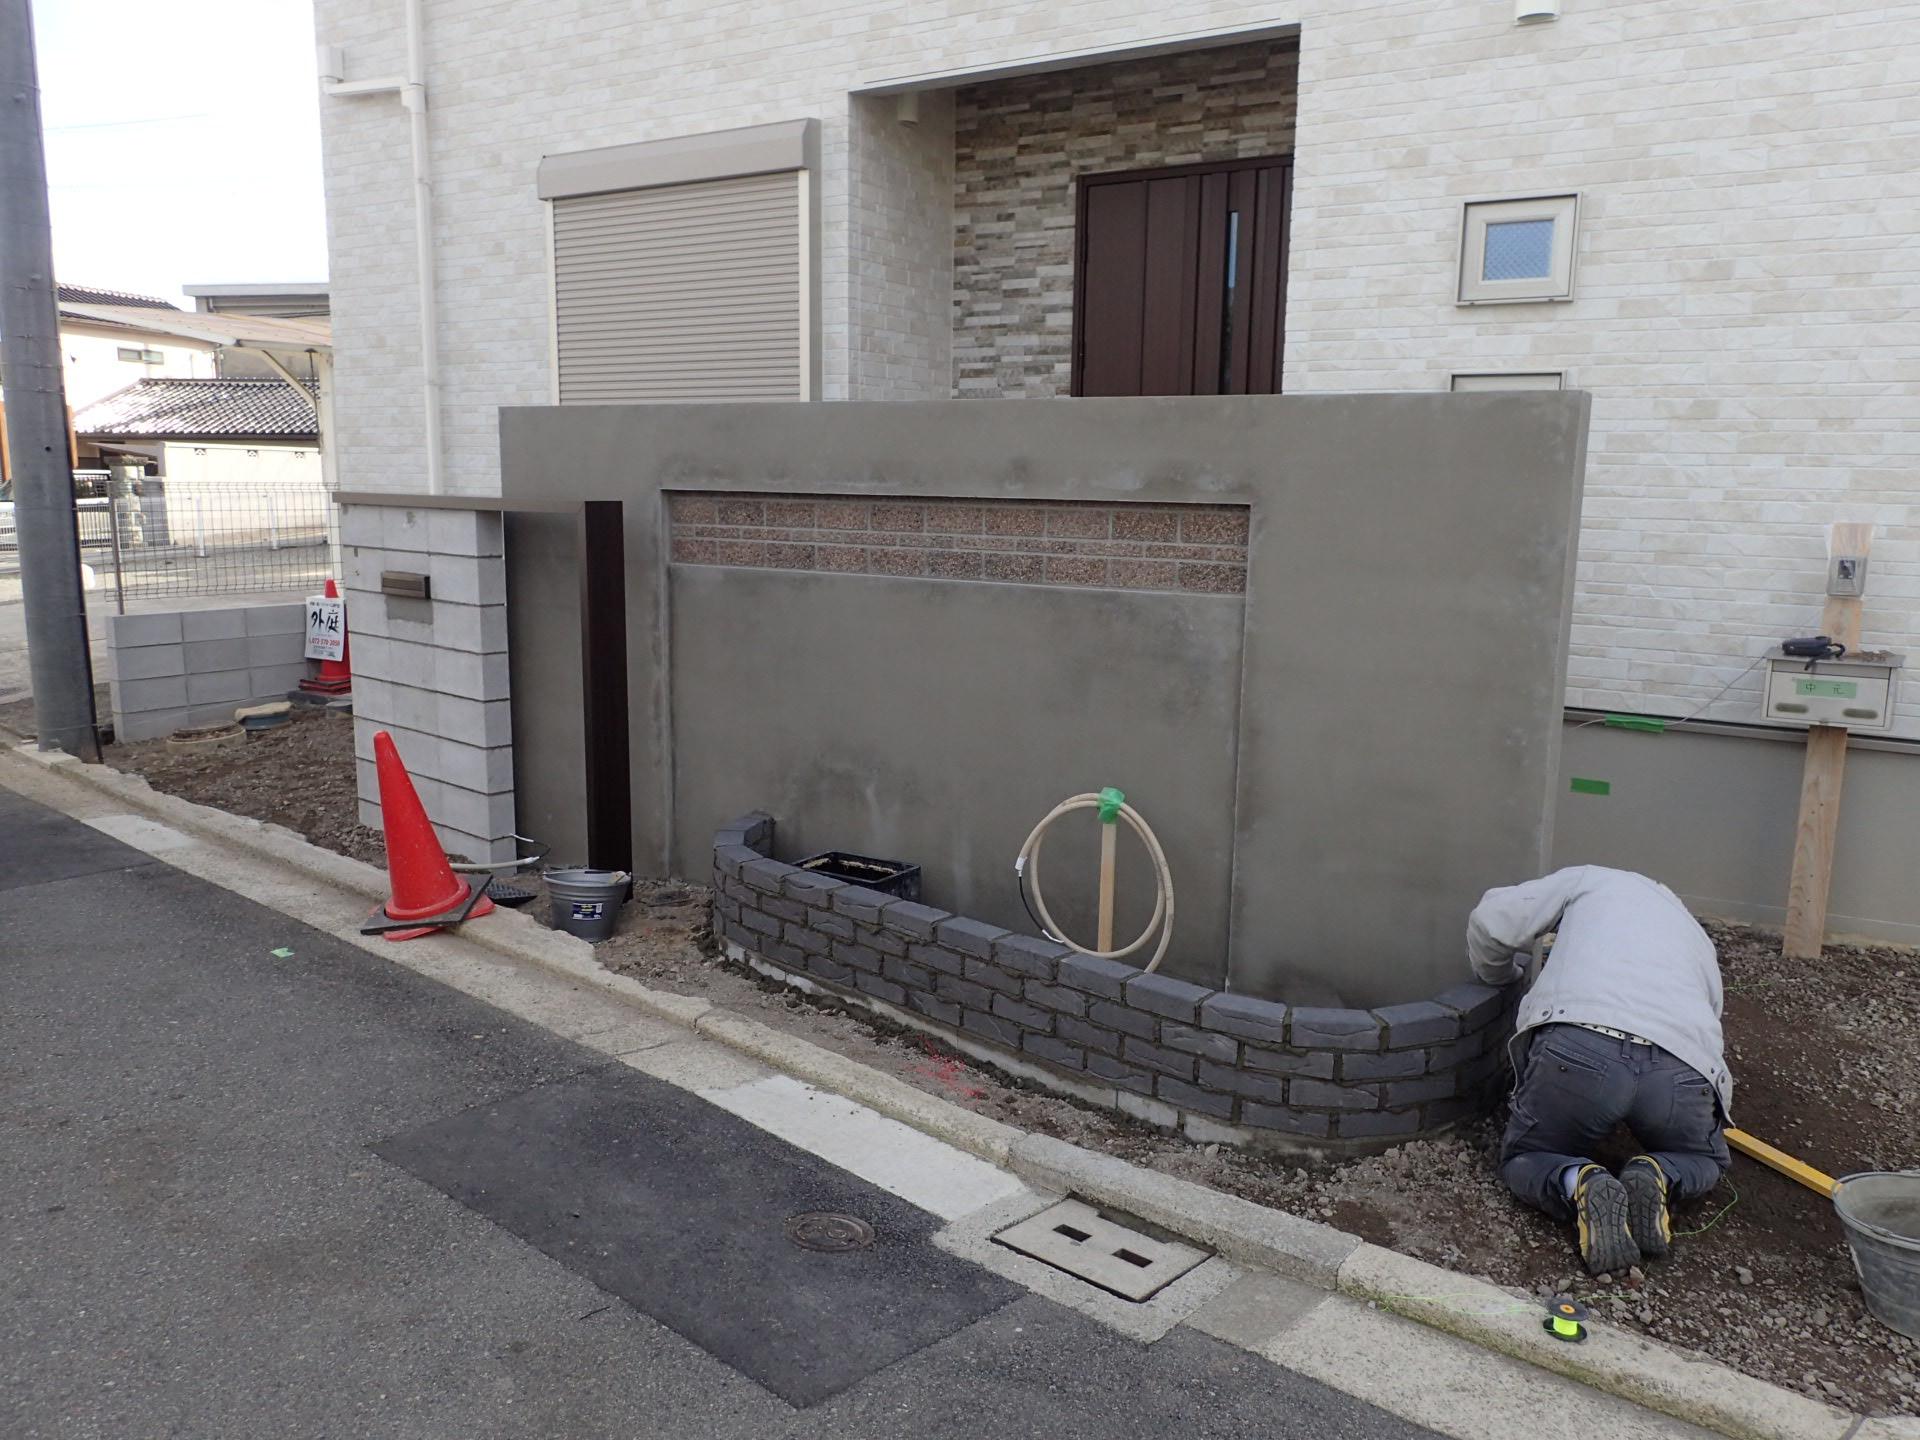 素敵な新築外構工事が進行中!